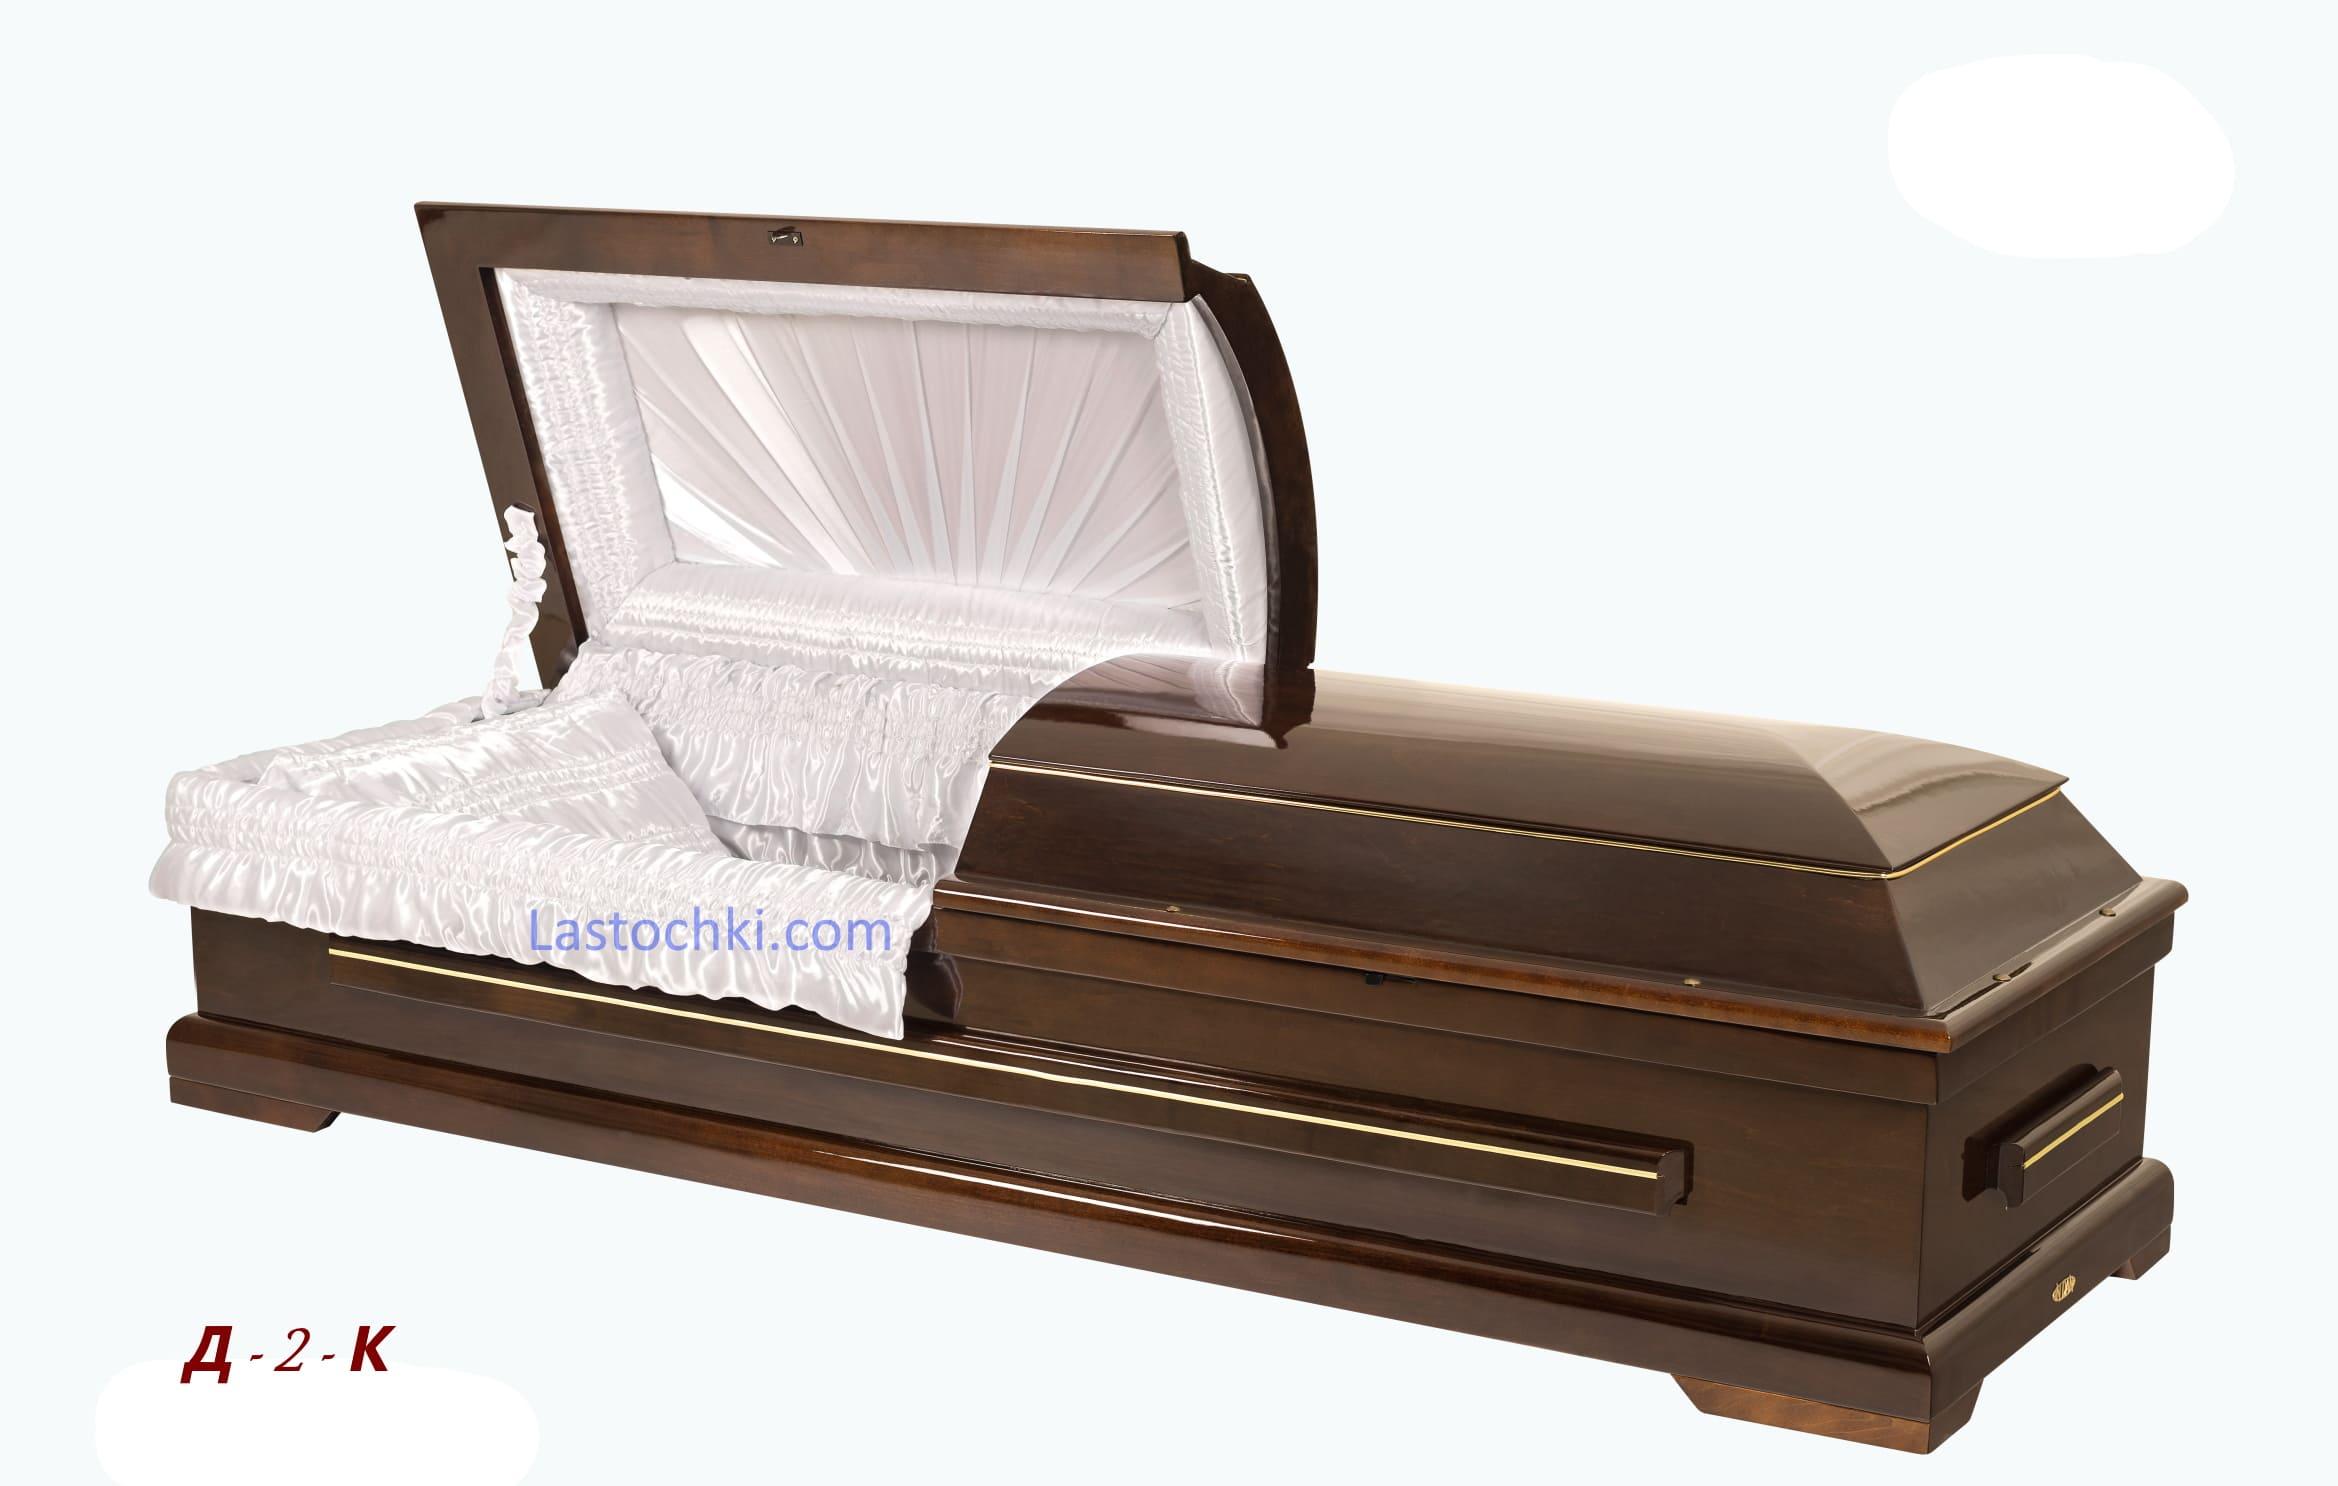 Саркофаг Д -2- К -  Цена 21 000 грн.